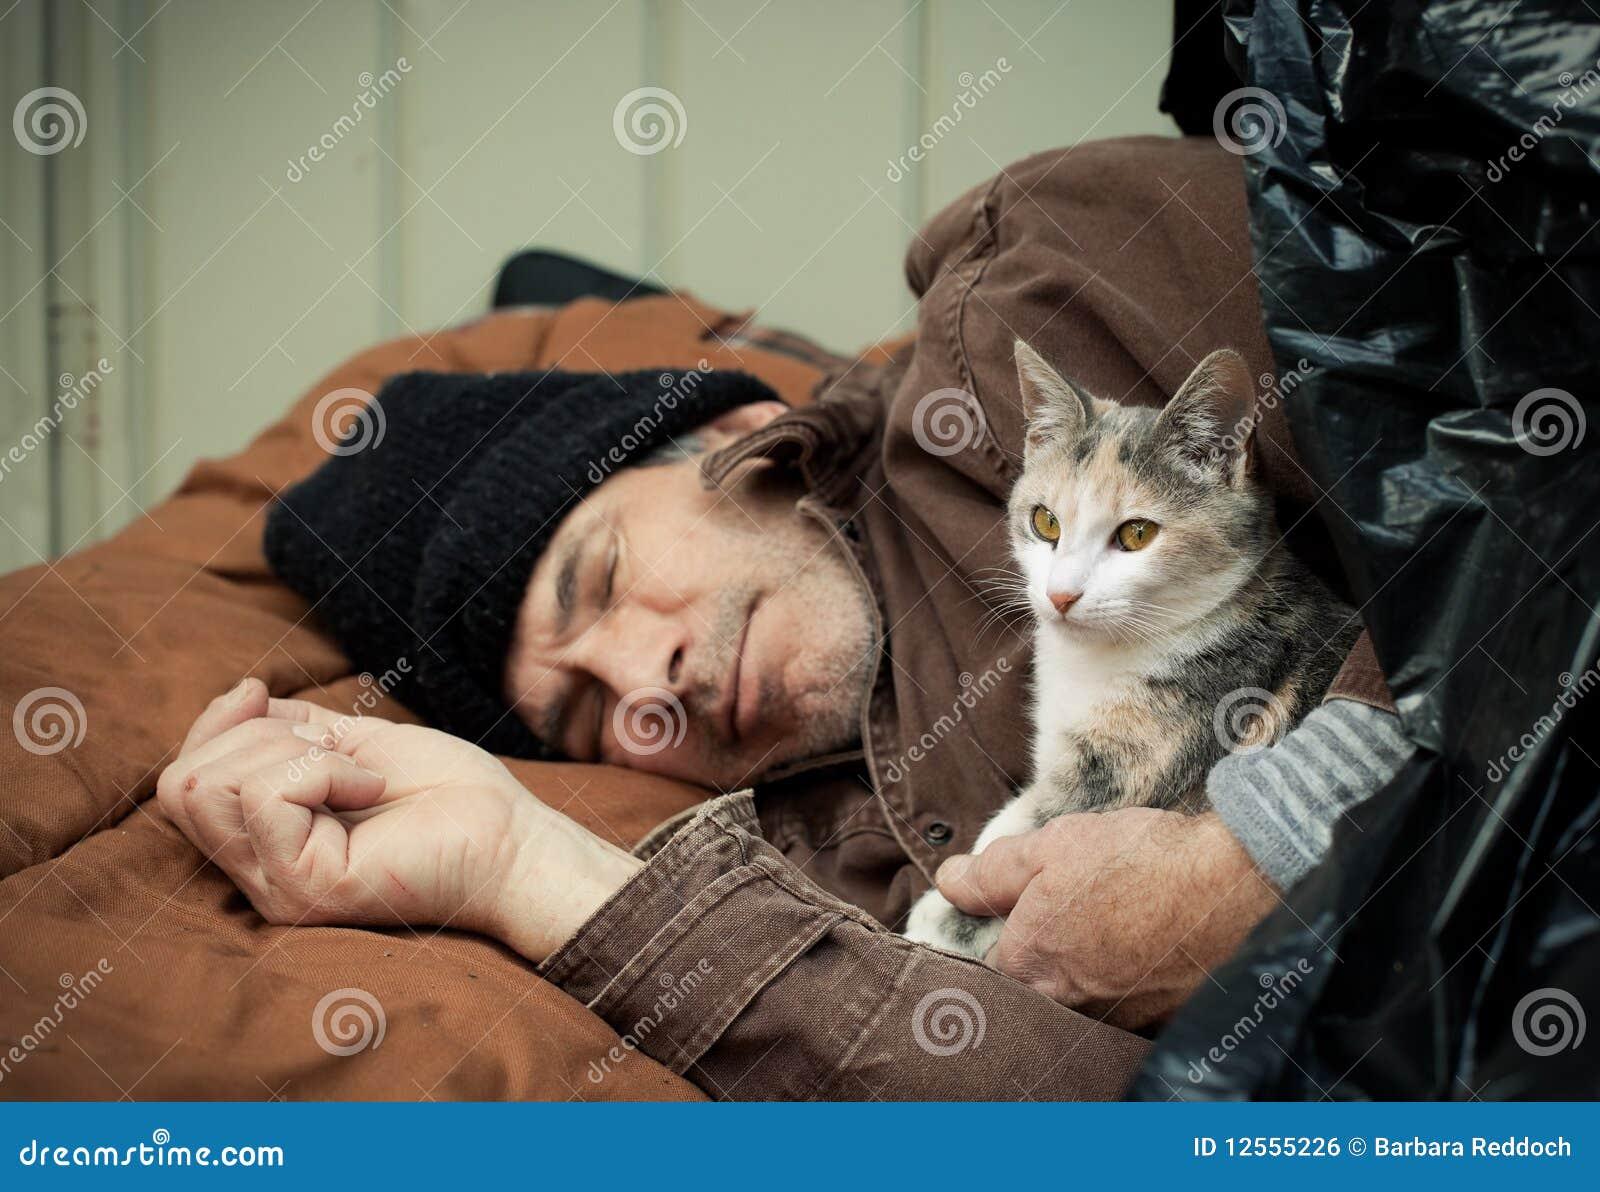 Homeless Man And Friendly Stray Kitten Royalty Free Stock ...